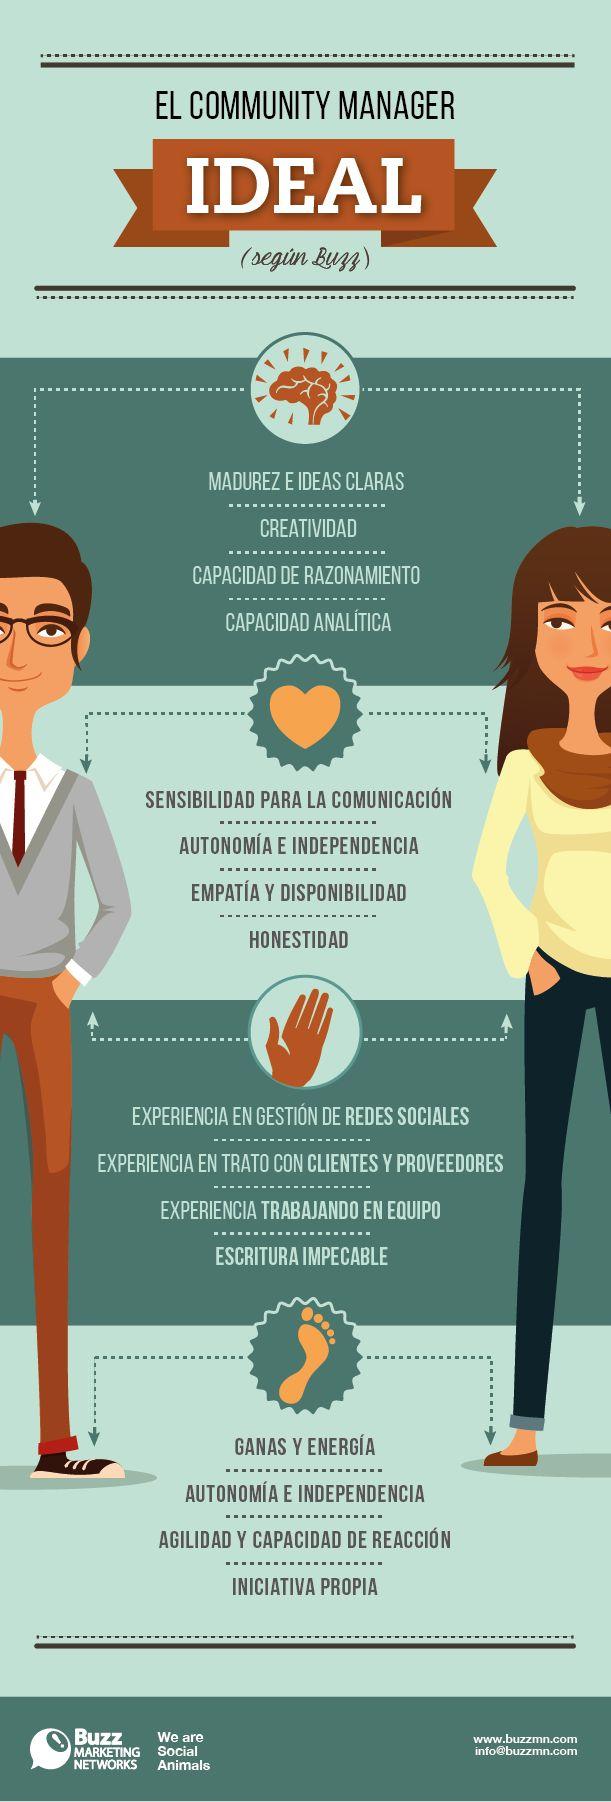 El Community Manager ideal #infografia #infographic #socialmedia vía @alfredovela